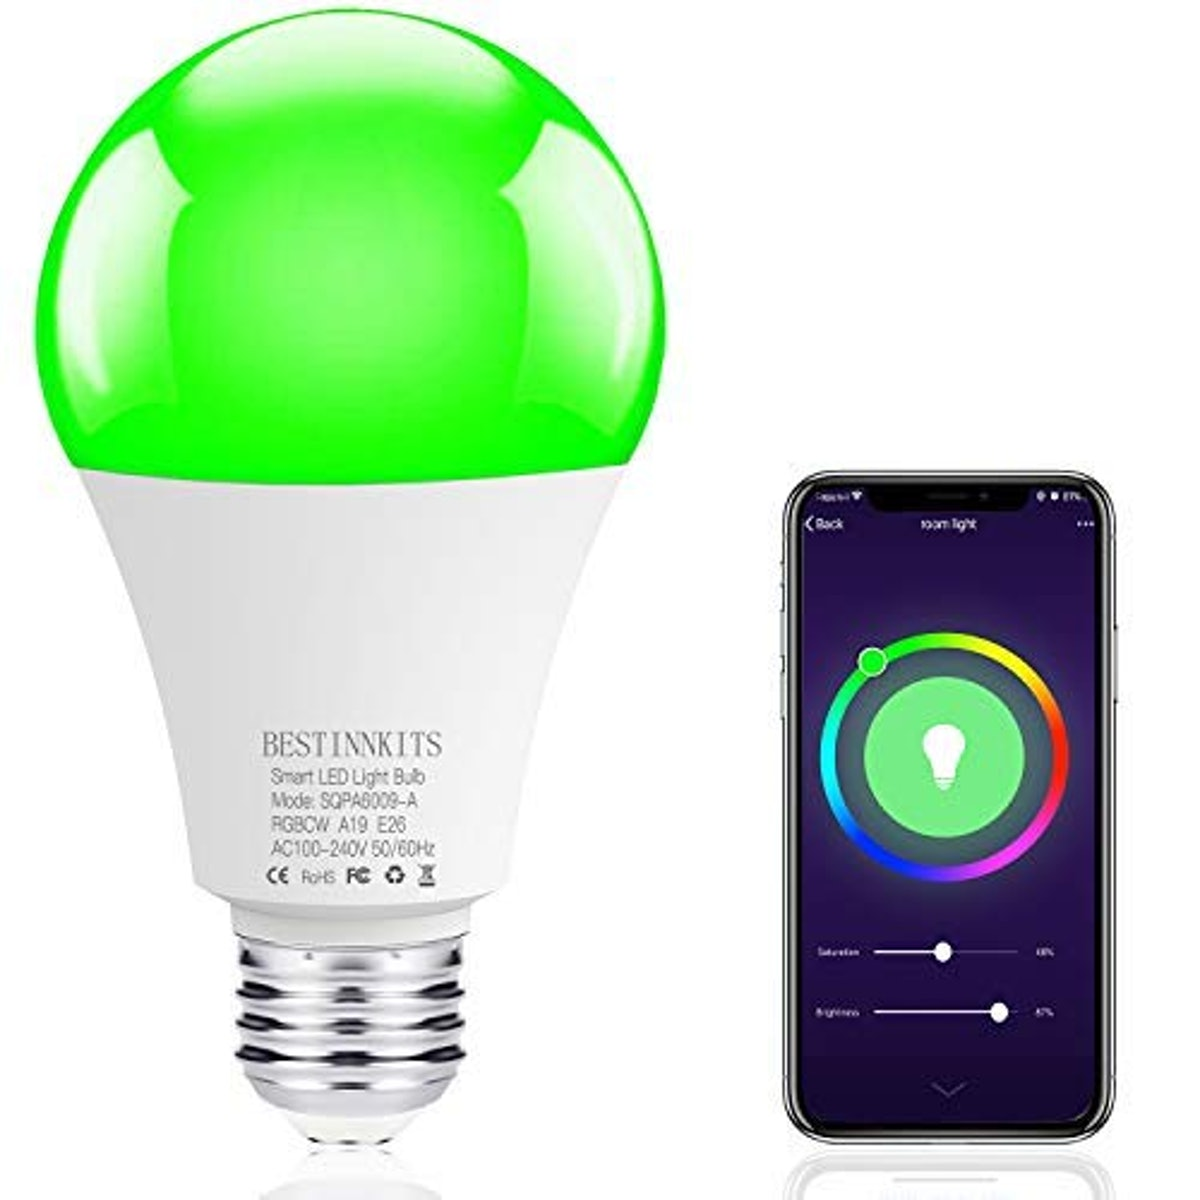 BESTINNKIT Color-Changing Smart Light Bulb